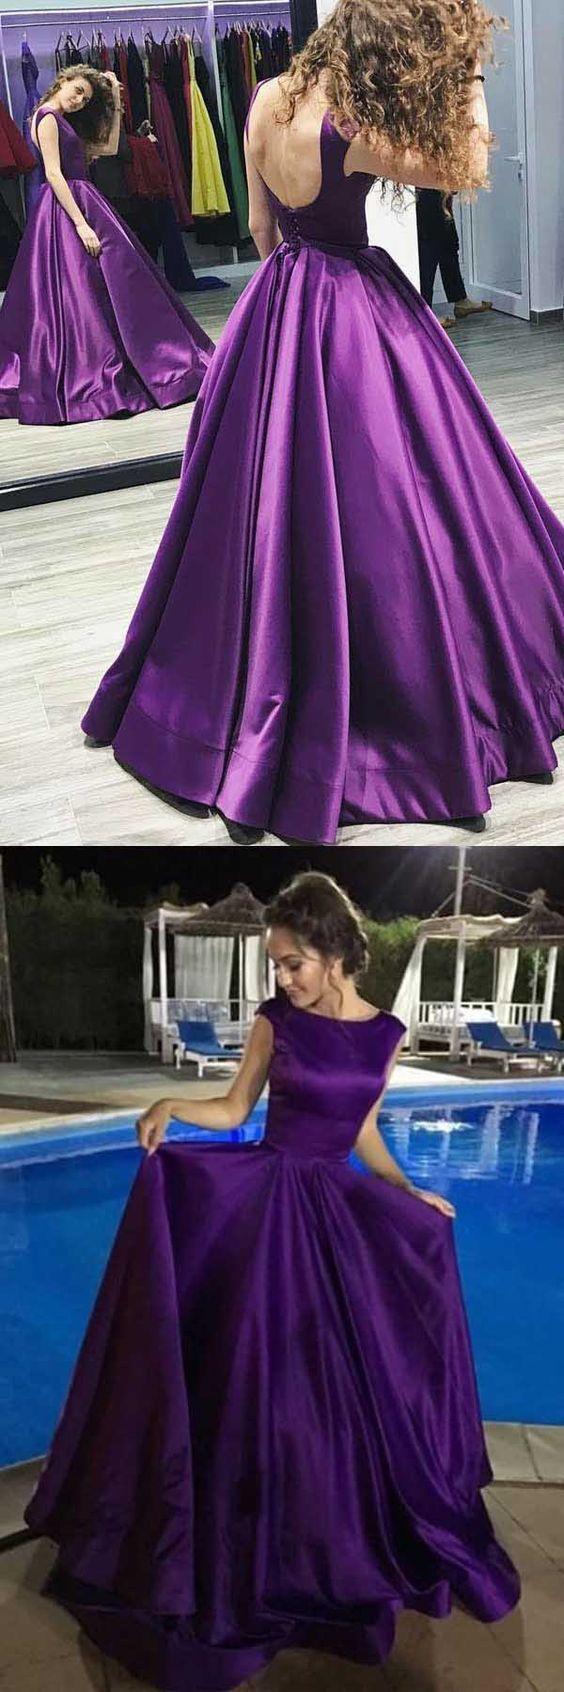 best vestidos images on pinterest classy dress long prom